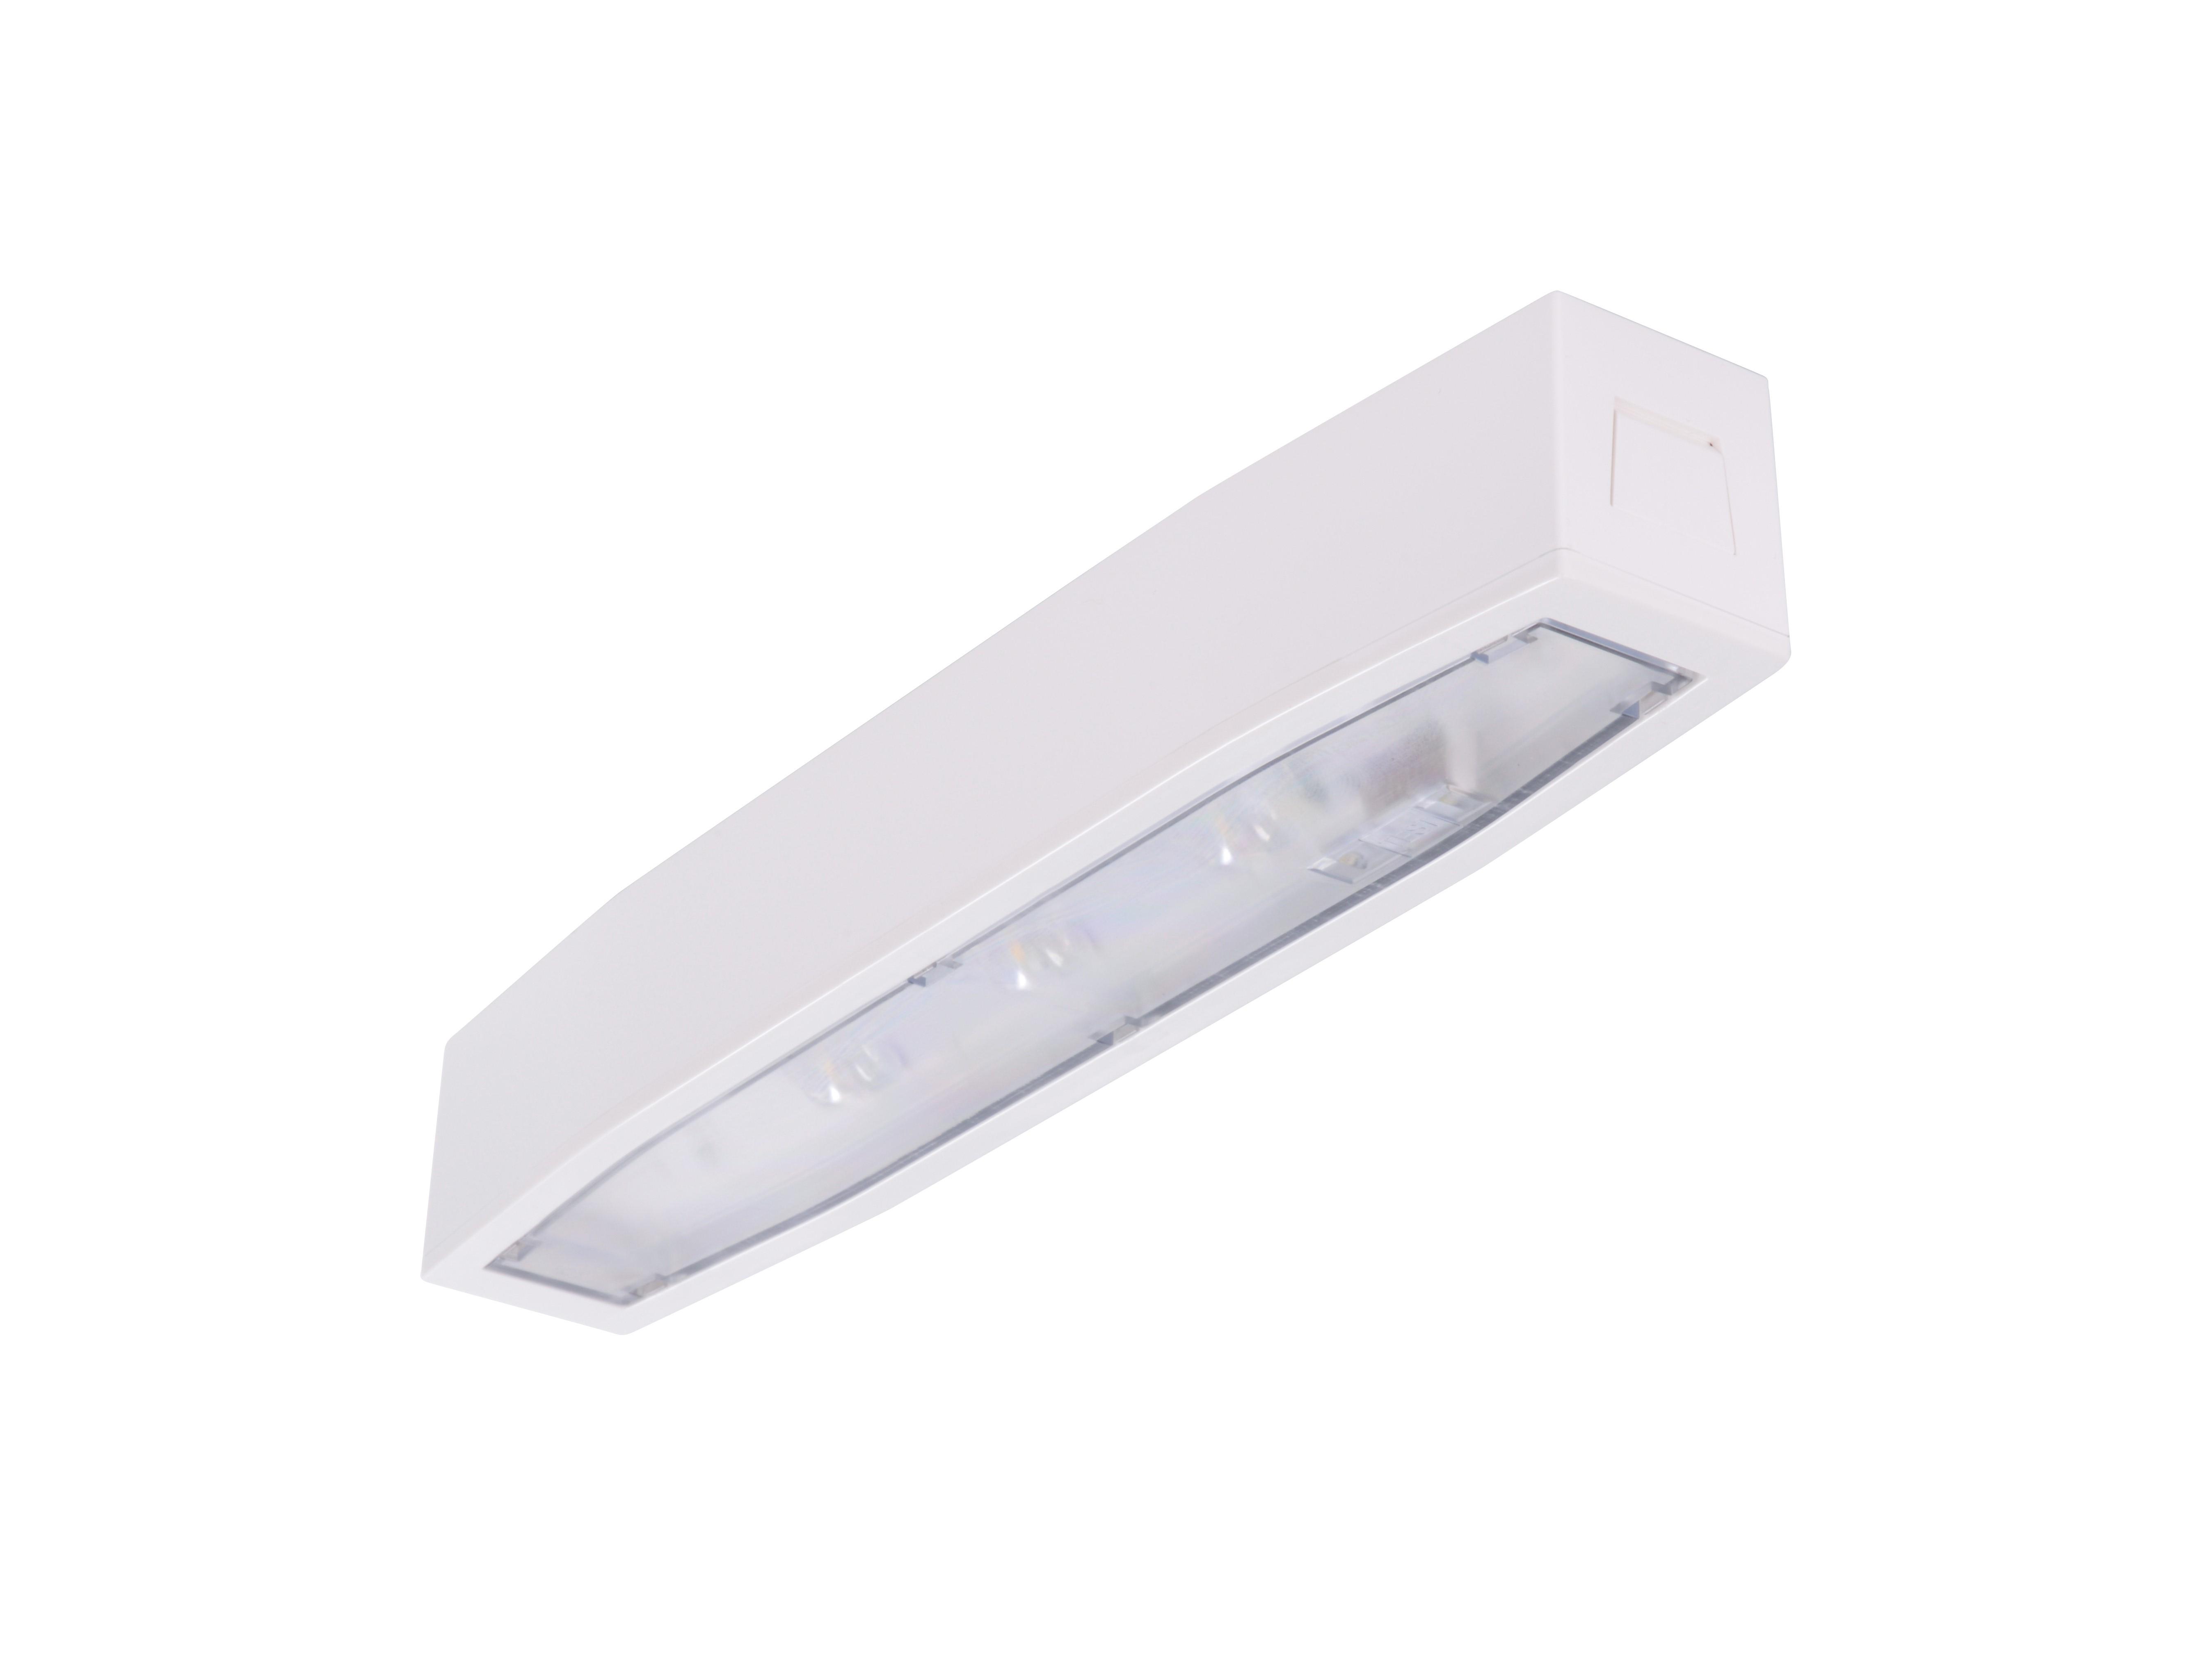 Lampa emergenta led Intelight 94717   3h nementinut test automat 0